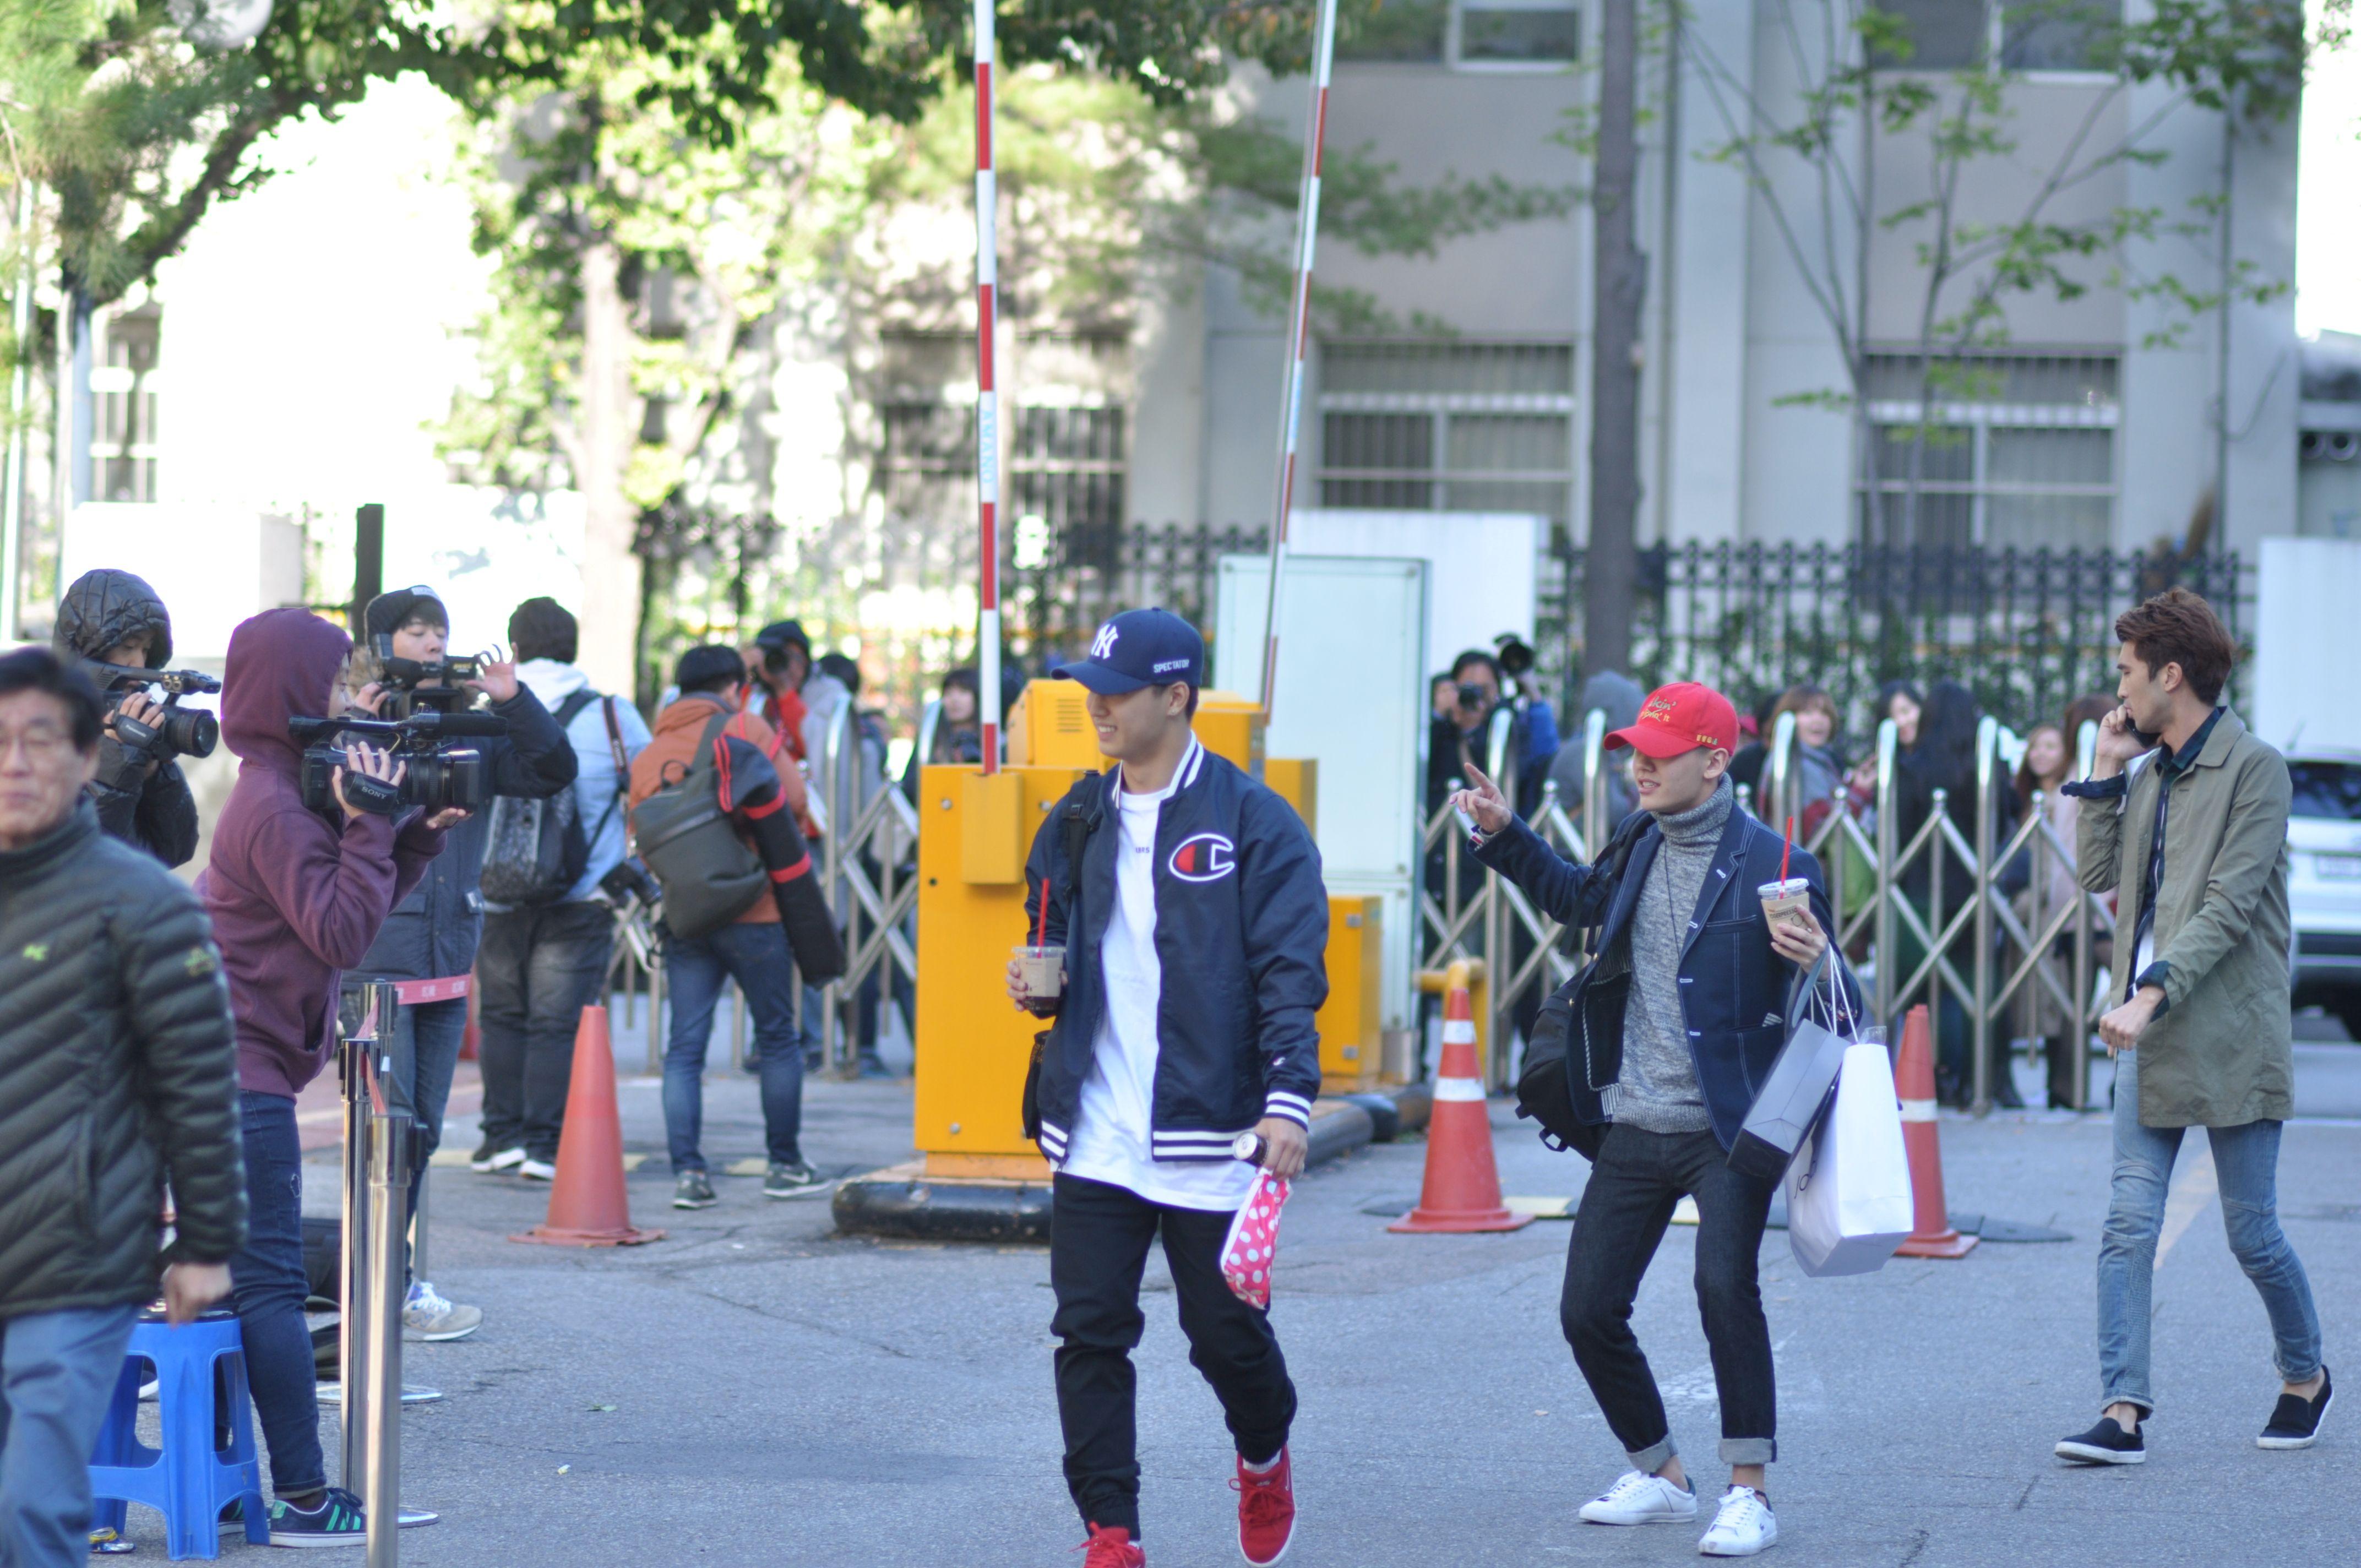 151030 BTOB arriving at Music Bank by KpopMap #musicbank, #kpopmap, #kpop, #btob, #kpopmap_btob, #kpopmap_1510230